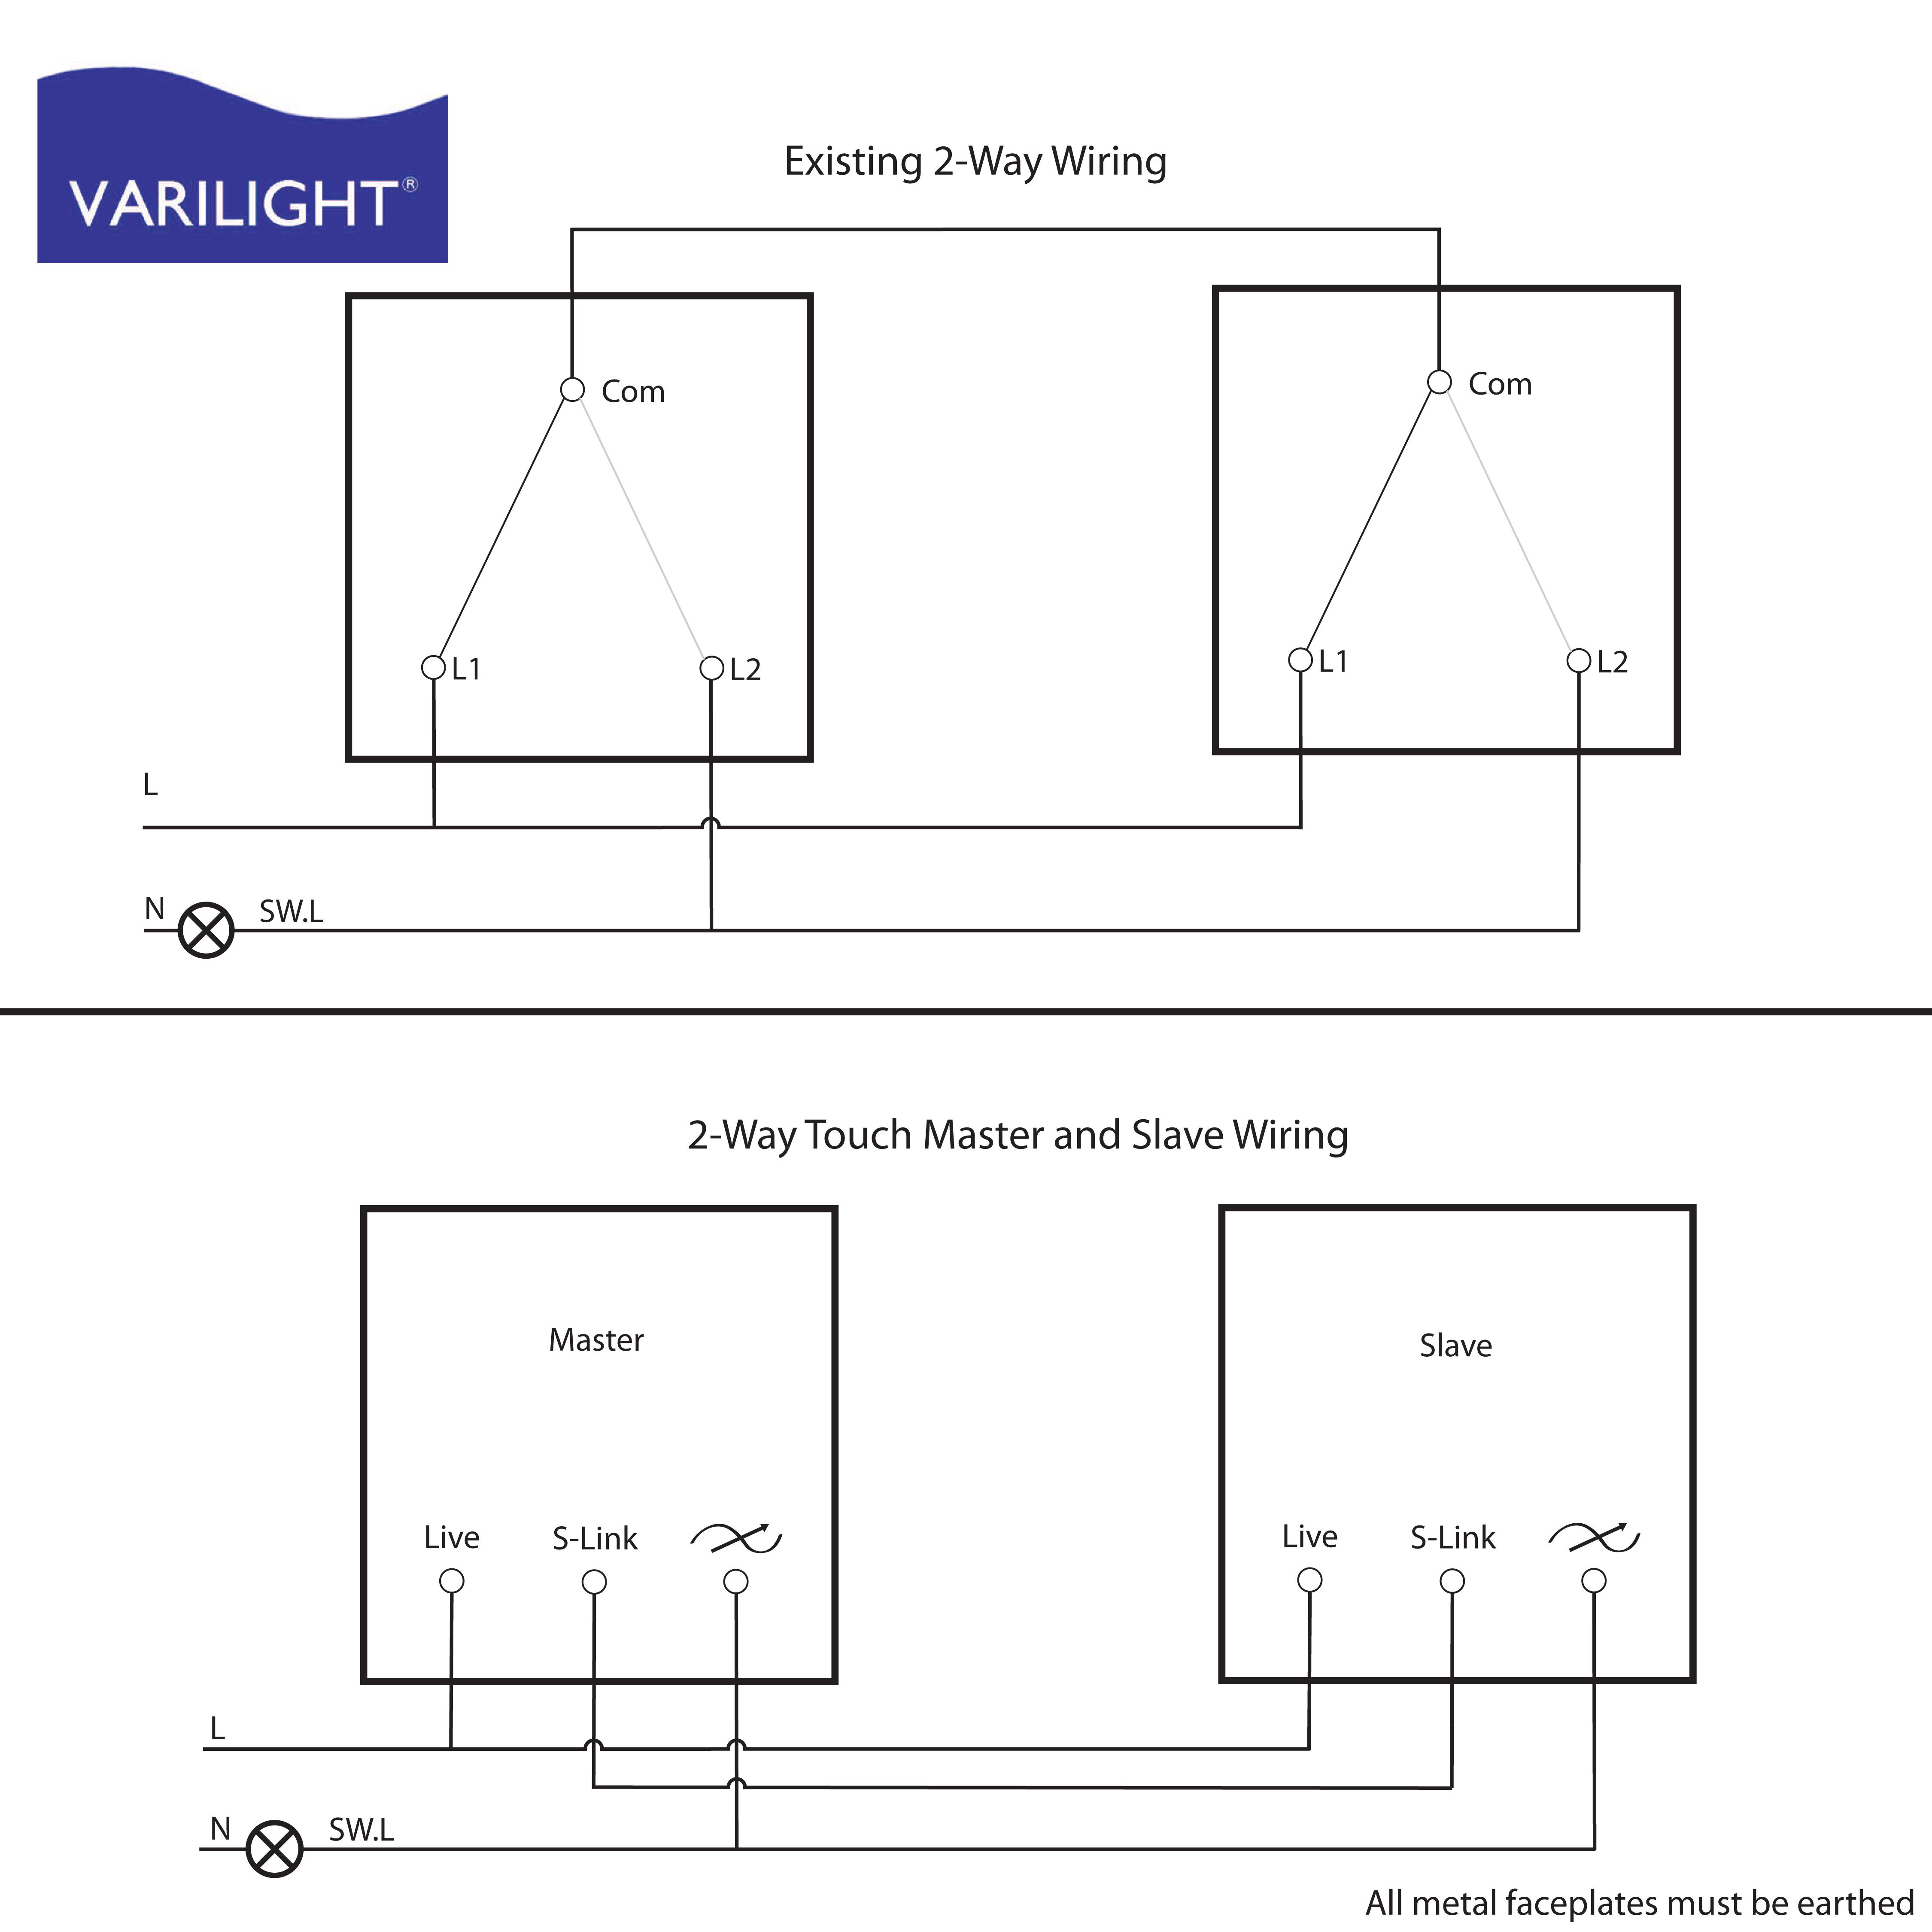 Varilight Wiring Diagrams - Dimming Switch Wiring Diagram